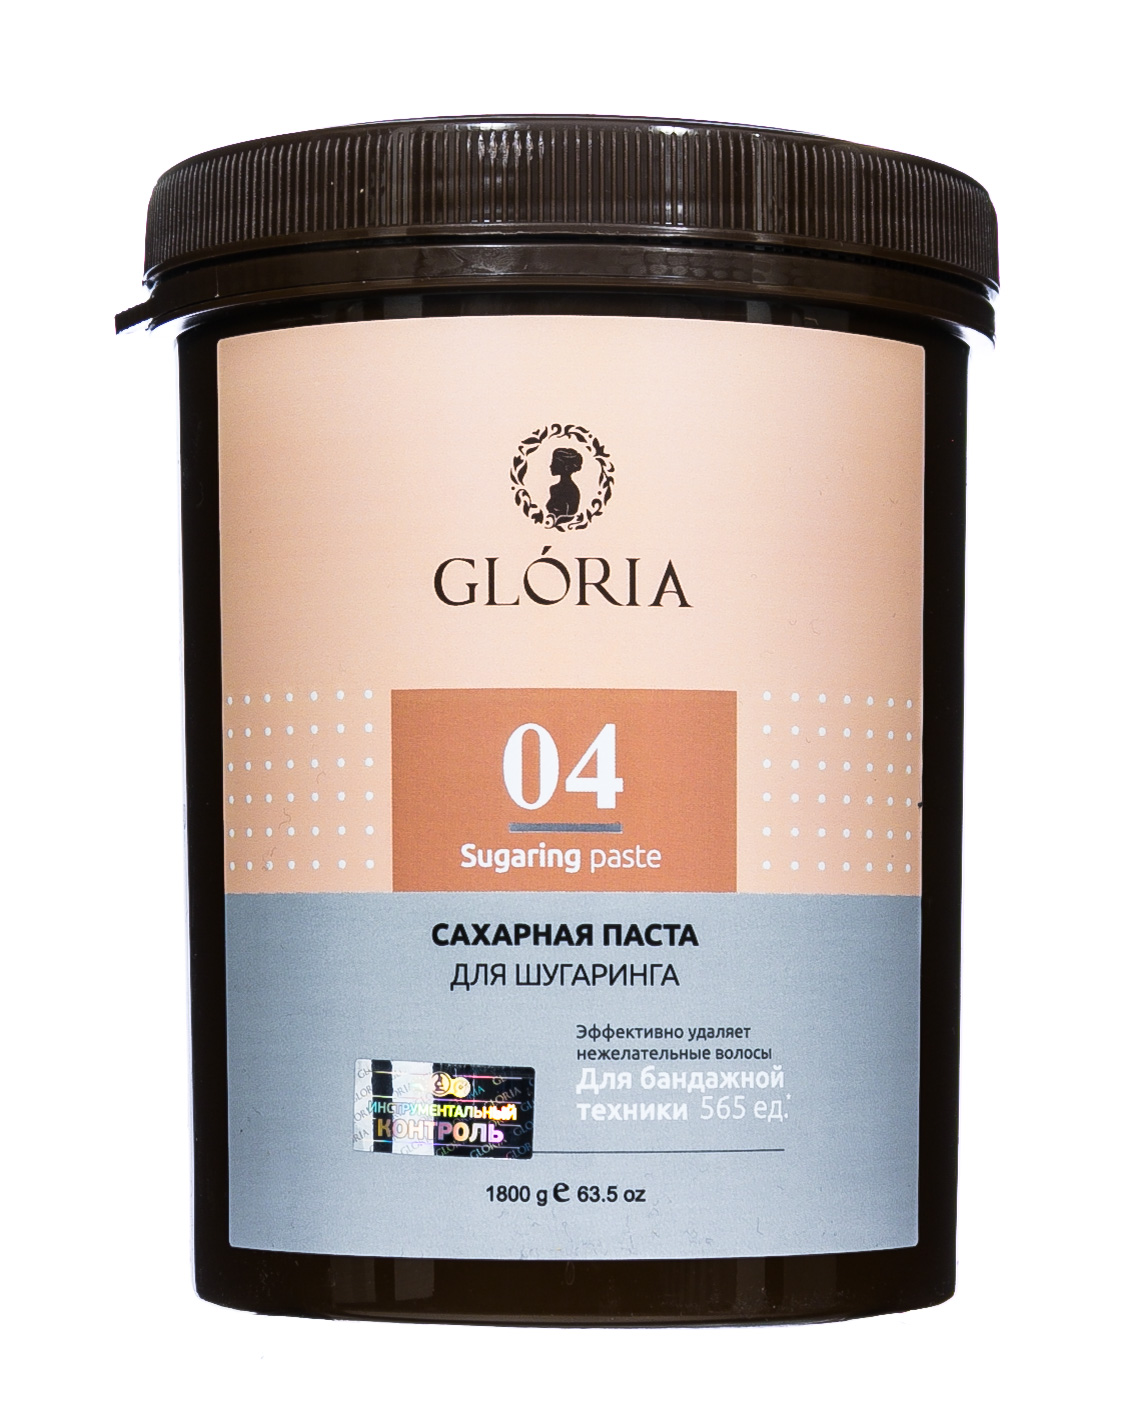 Gloria Сахарная паста для депиляции Бандажная, 1800 гр (Gloria, Gloria Classic)